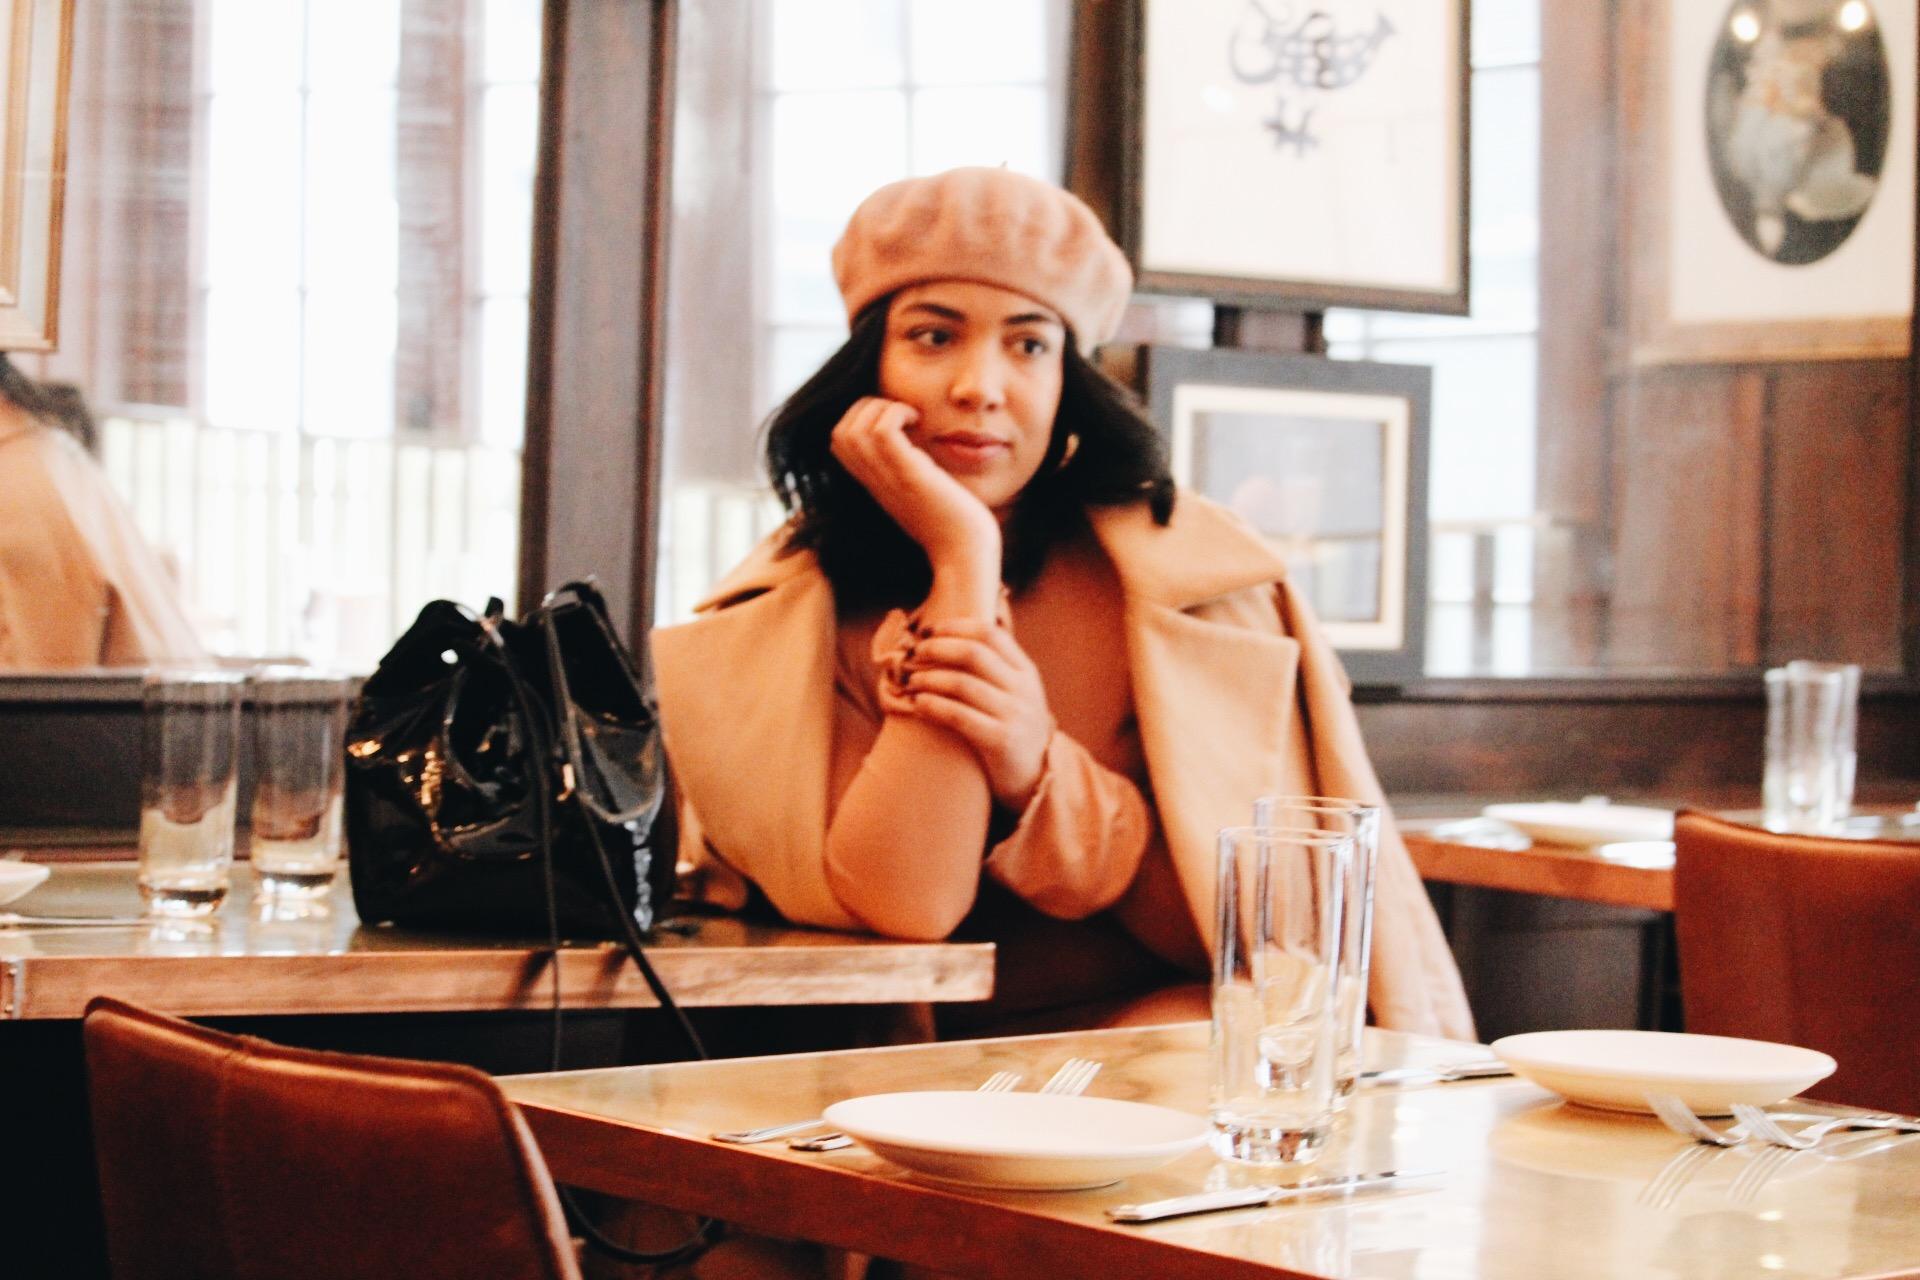 Soho-NYC-Cafe-integral-egg-shop-asos-trench-turtleneck-maxi-dress-hue-tights-patent-bucket-bag-3.JPG